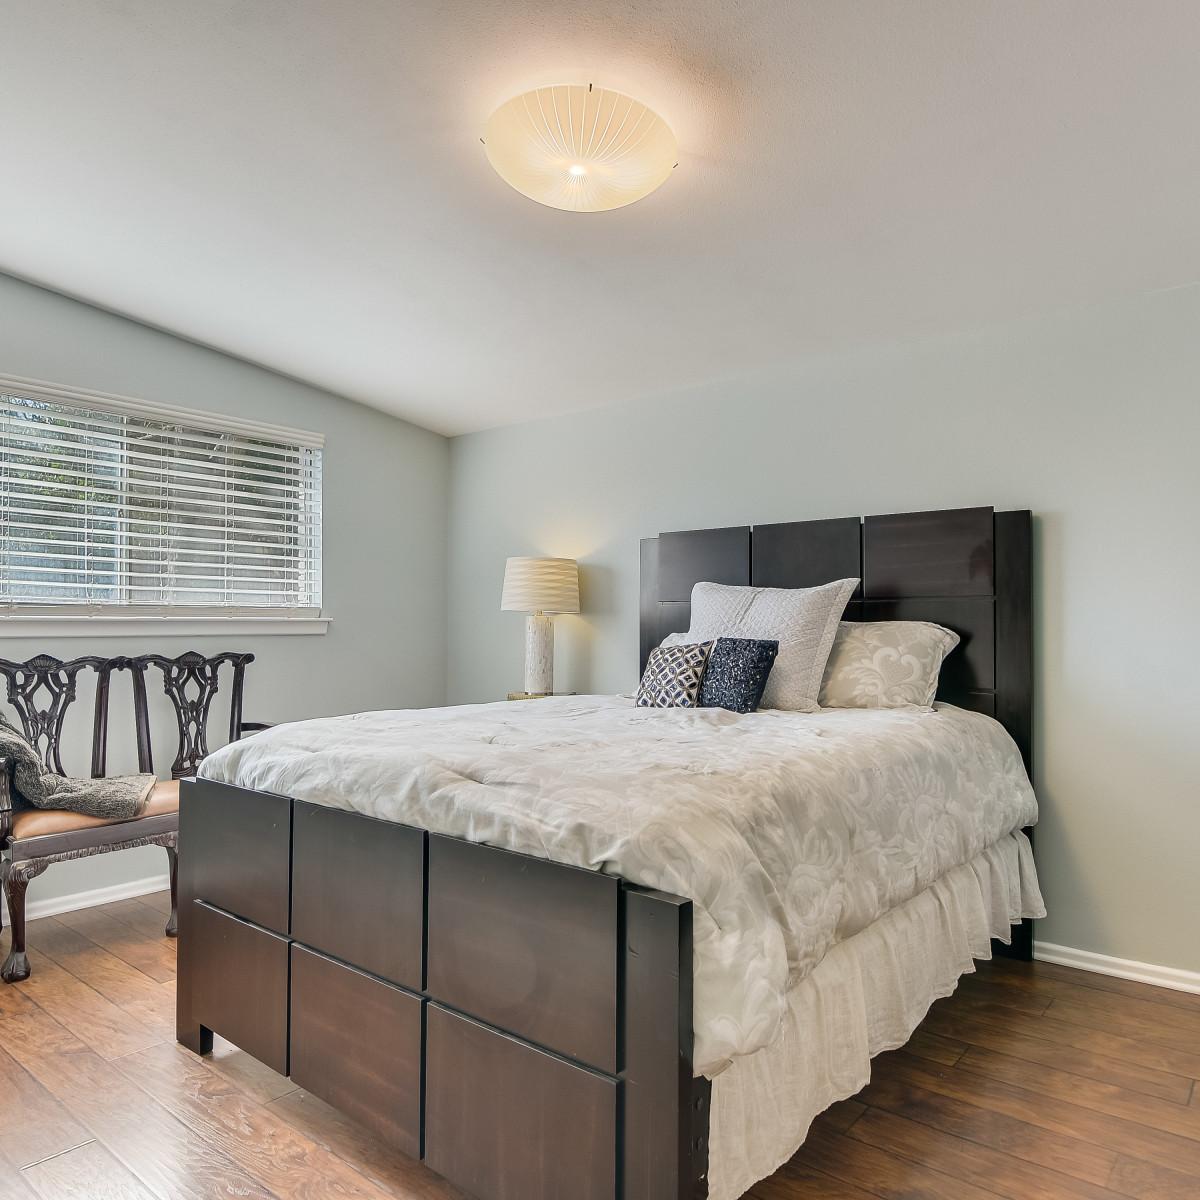 3010 Albin San Antonio house for sale bedroom